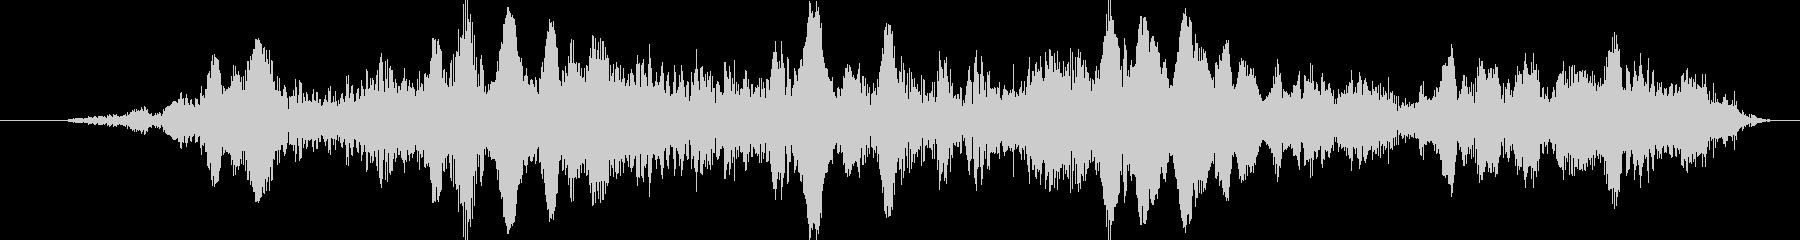 UFOキャッチャーっぽい音の未再生の波形